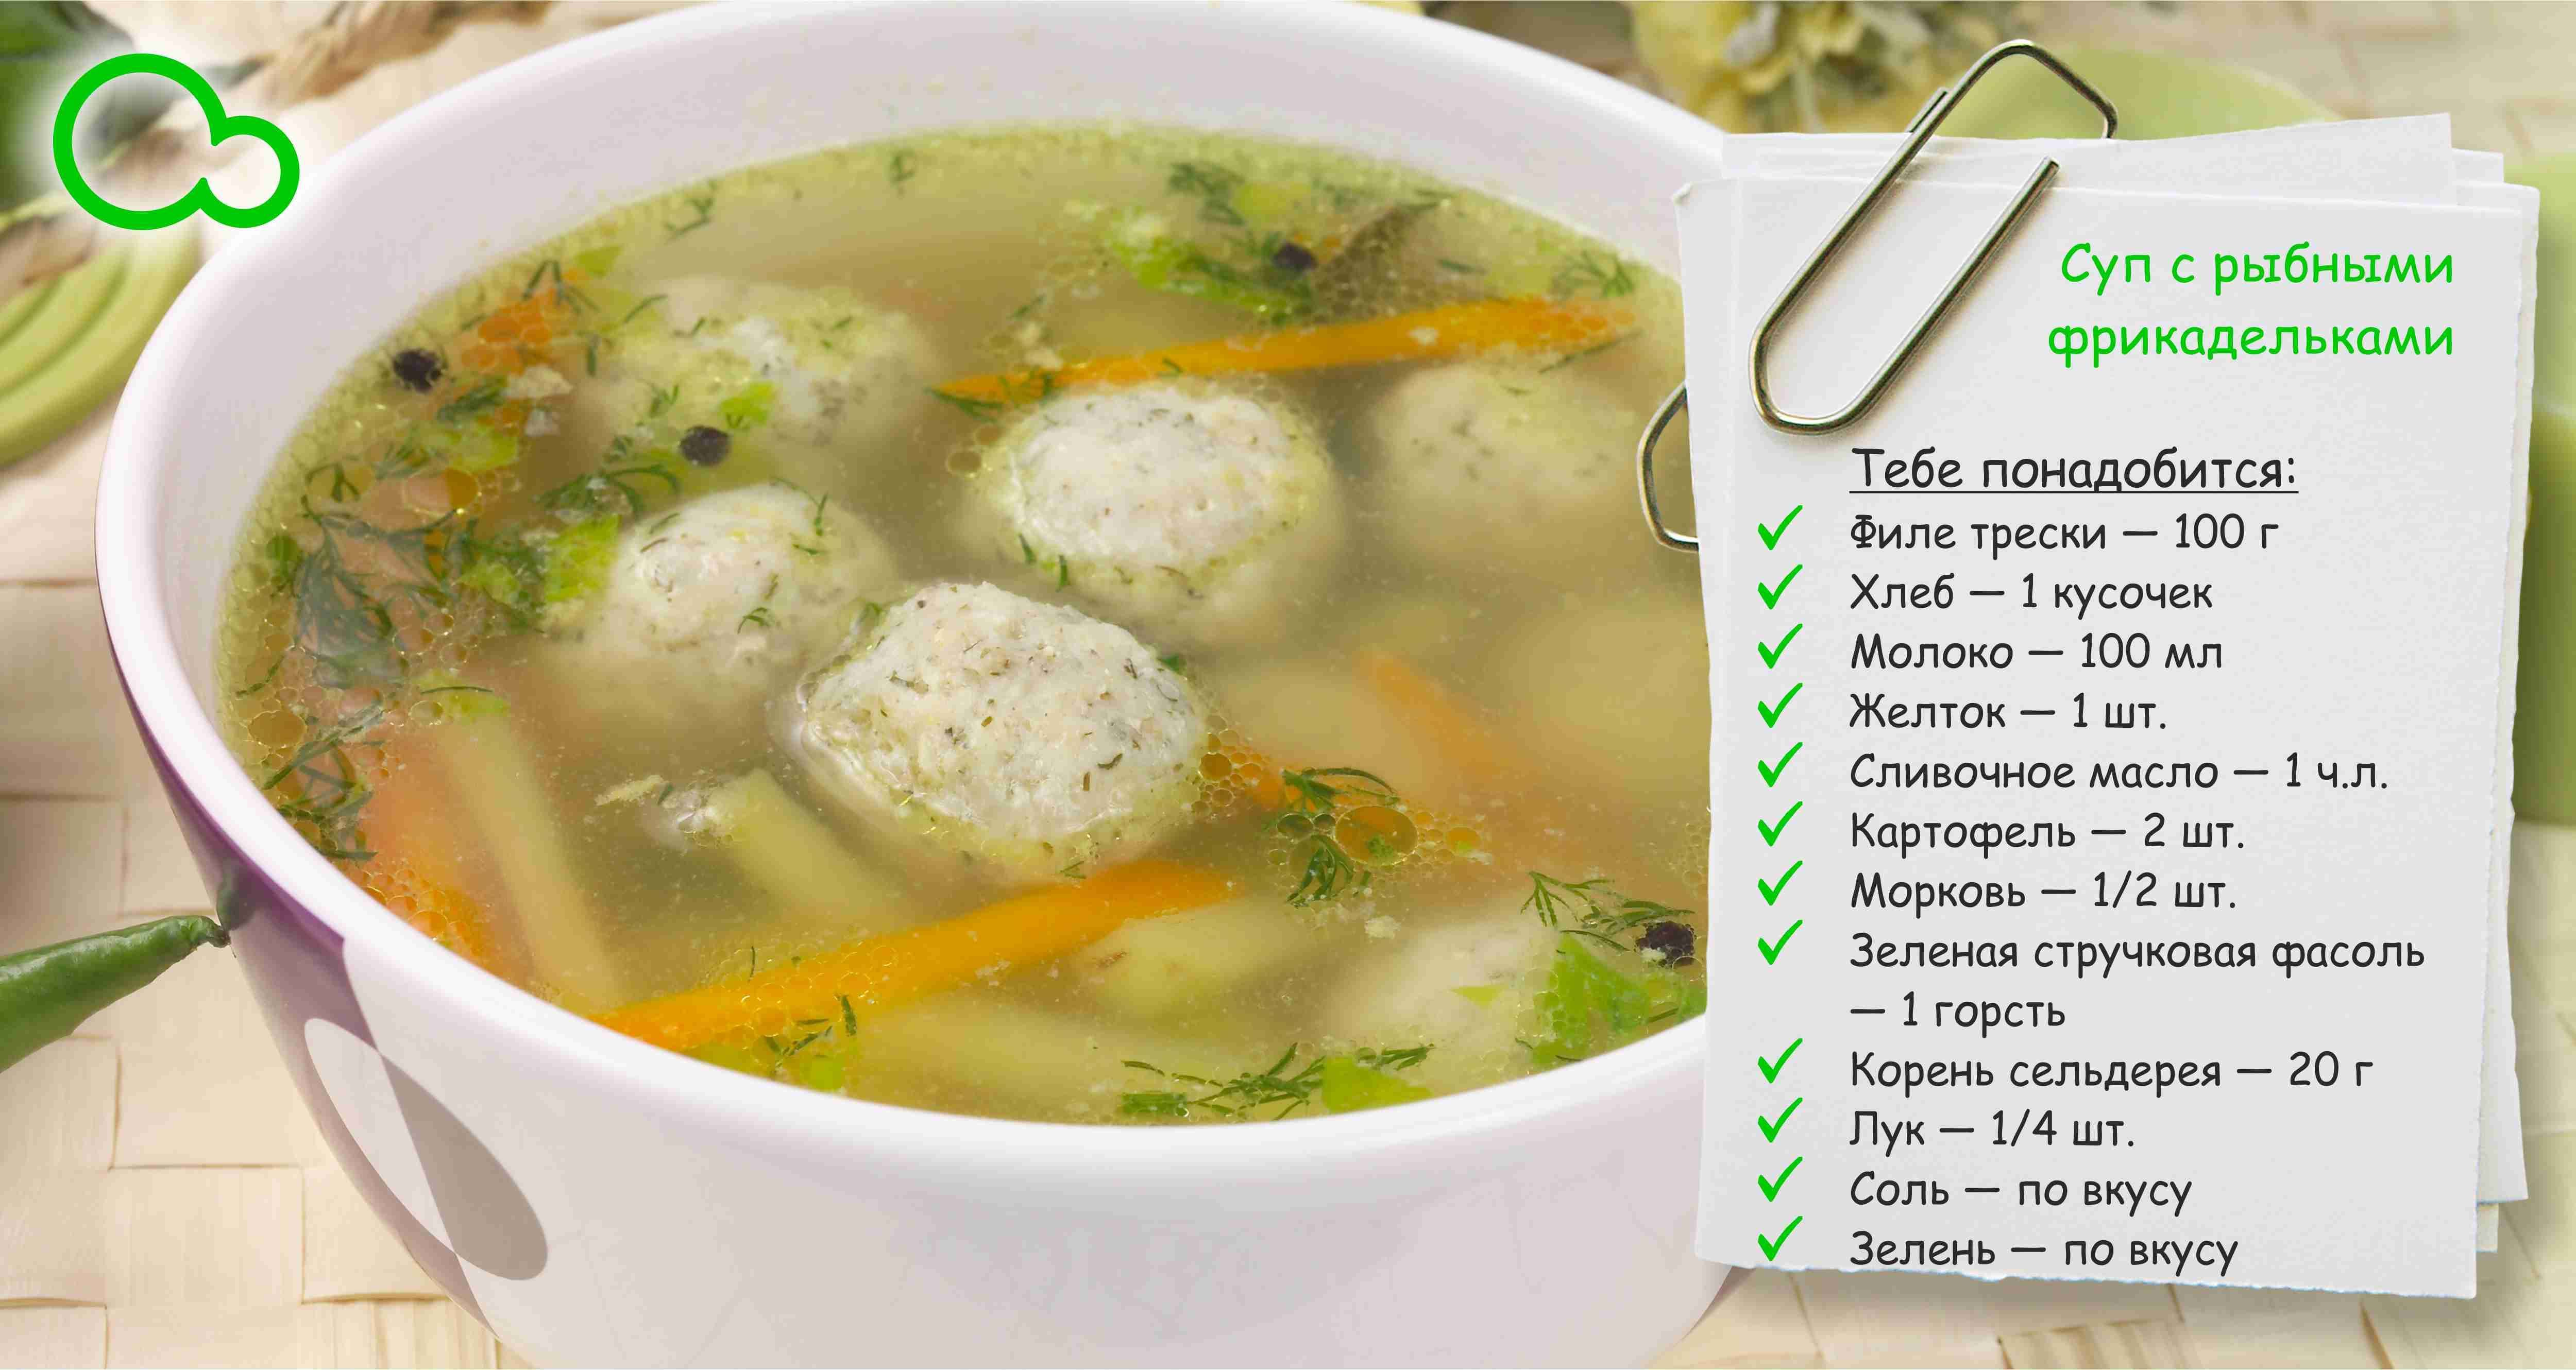 Два рецепта супа с фрикадельками из рыбного фарша